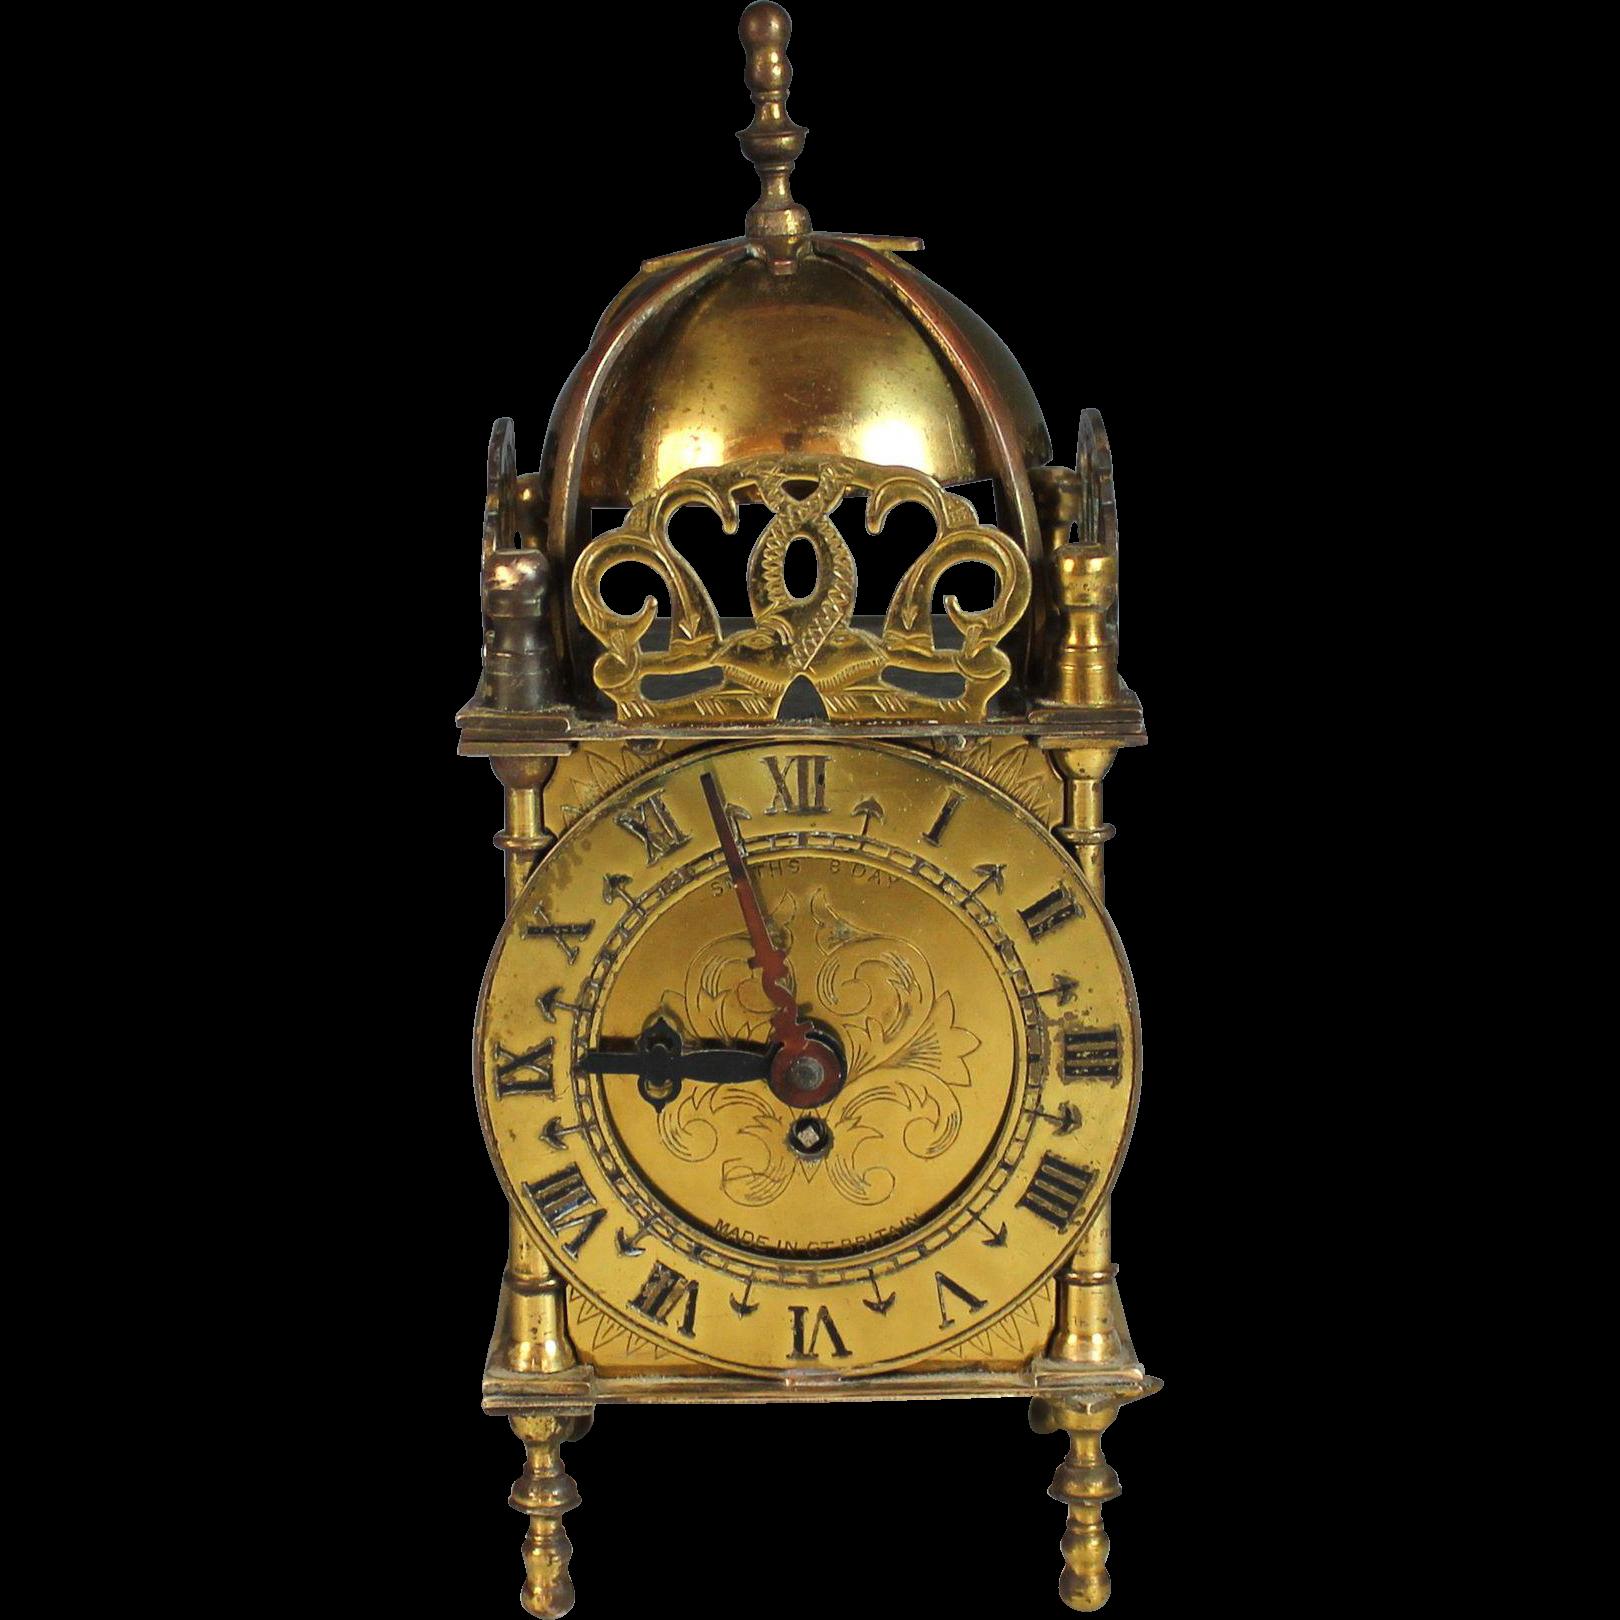 Vintage Nell Gwynne English Made Lantern Clock 8 Day Mechanical Wind Clock Retro Clock Vintage Clock